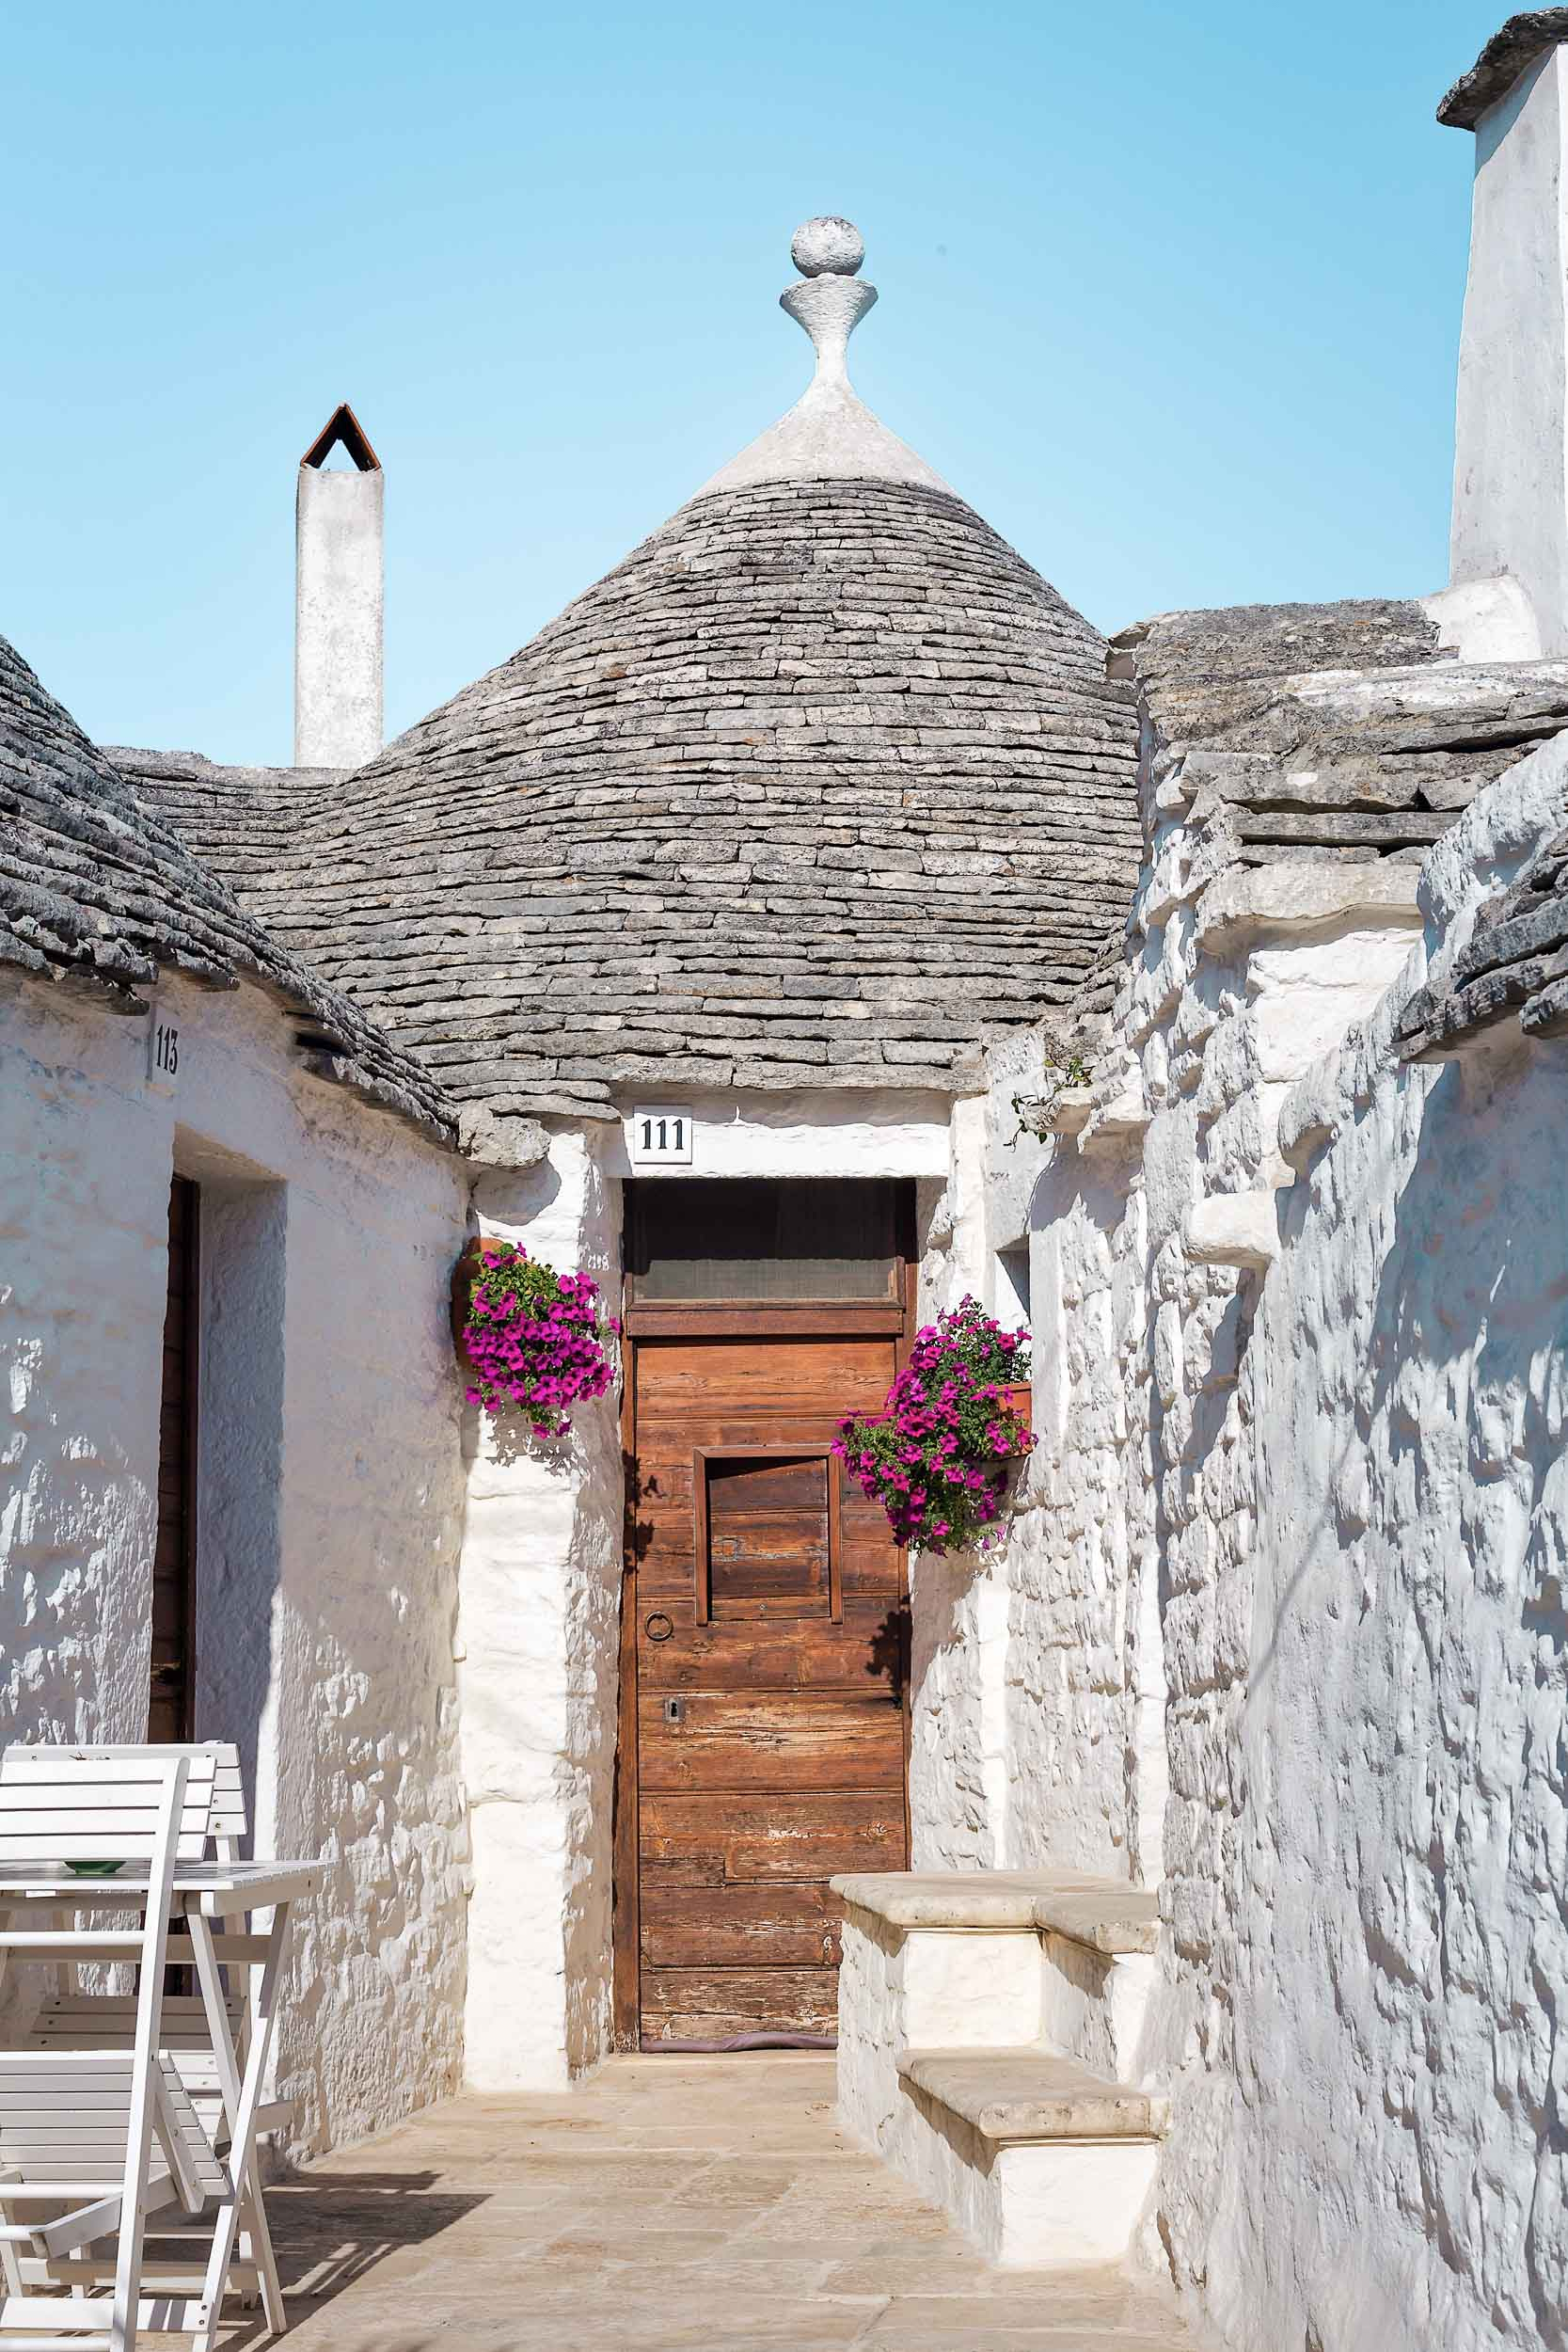 Where to stay in Alberobello, Italy